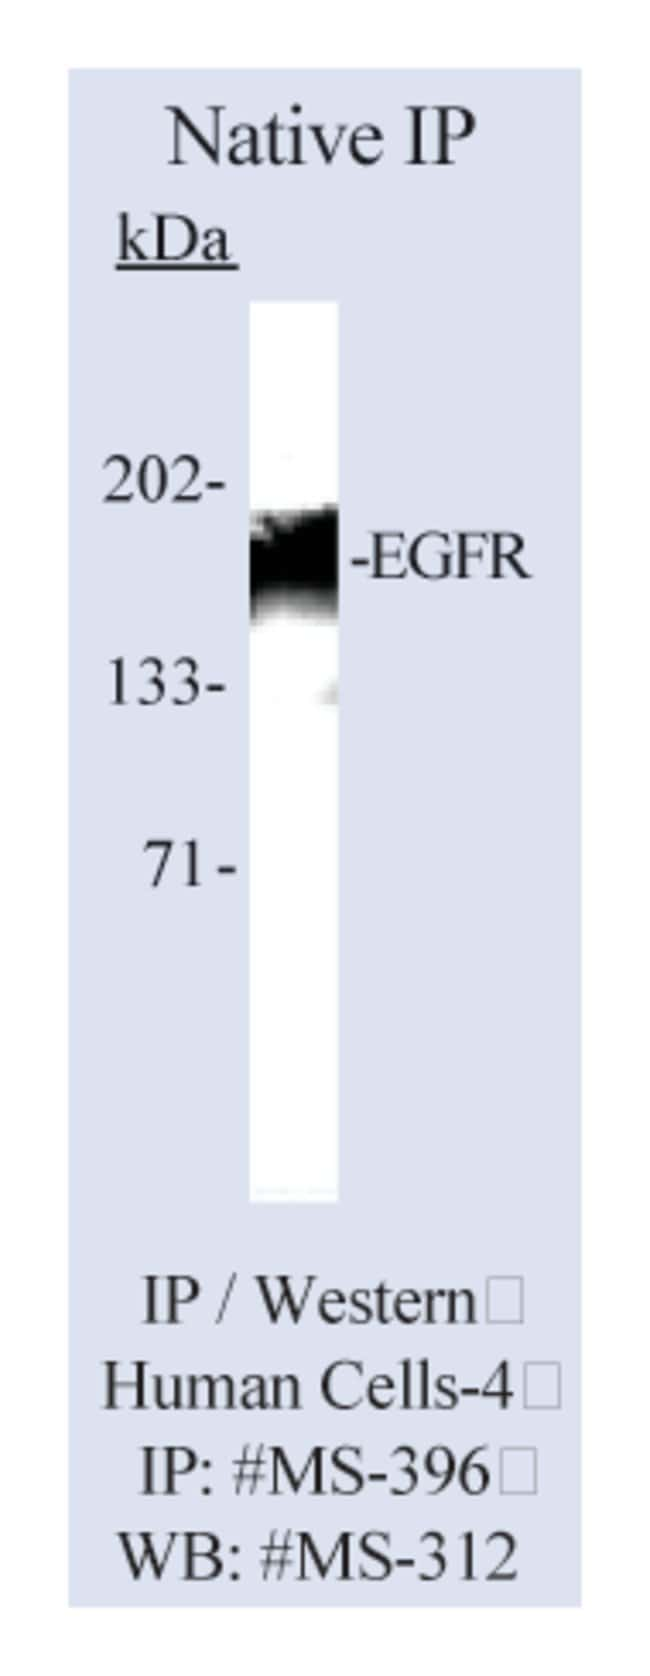 Thermo Scientific Lab Vision Epidermal Growth Factor Receptor/EGFR Ab-11,